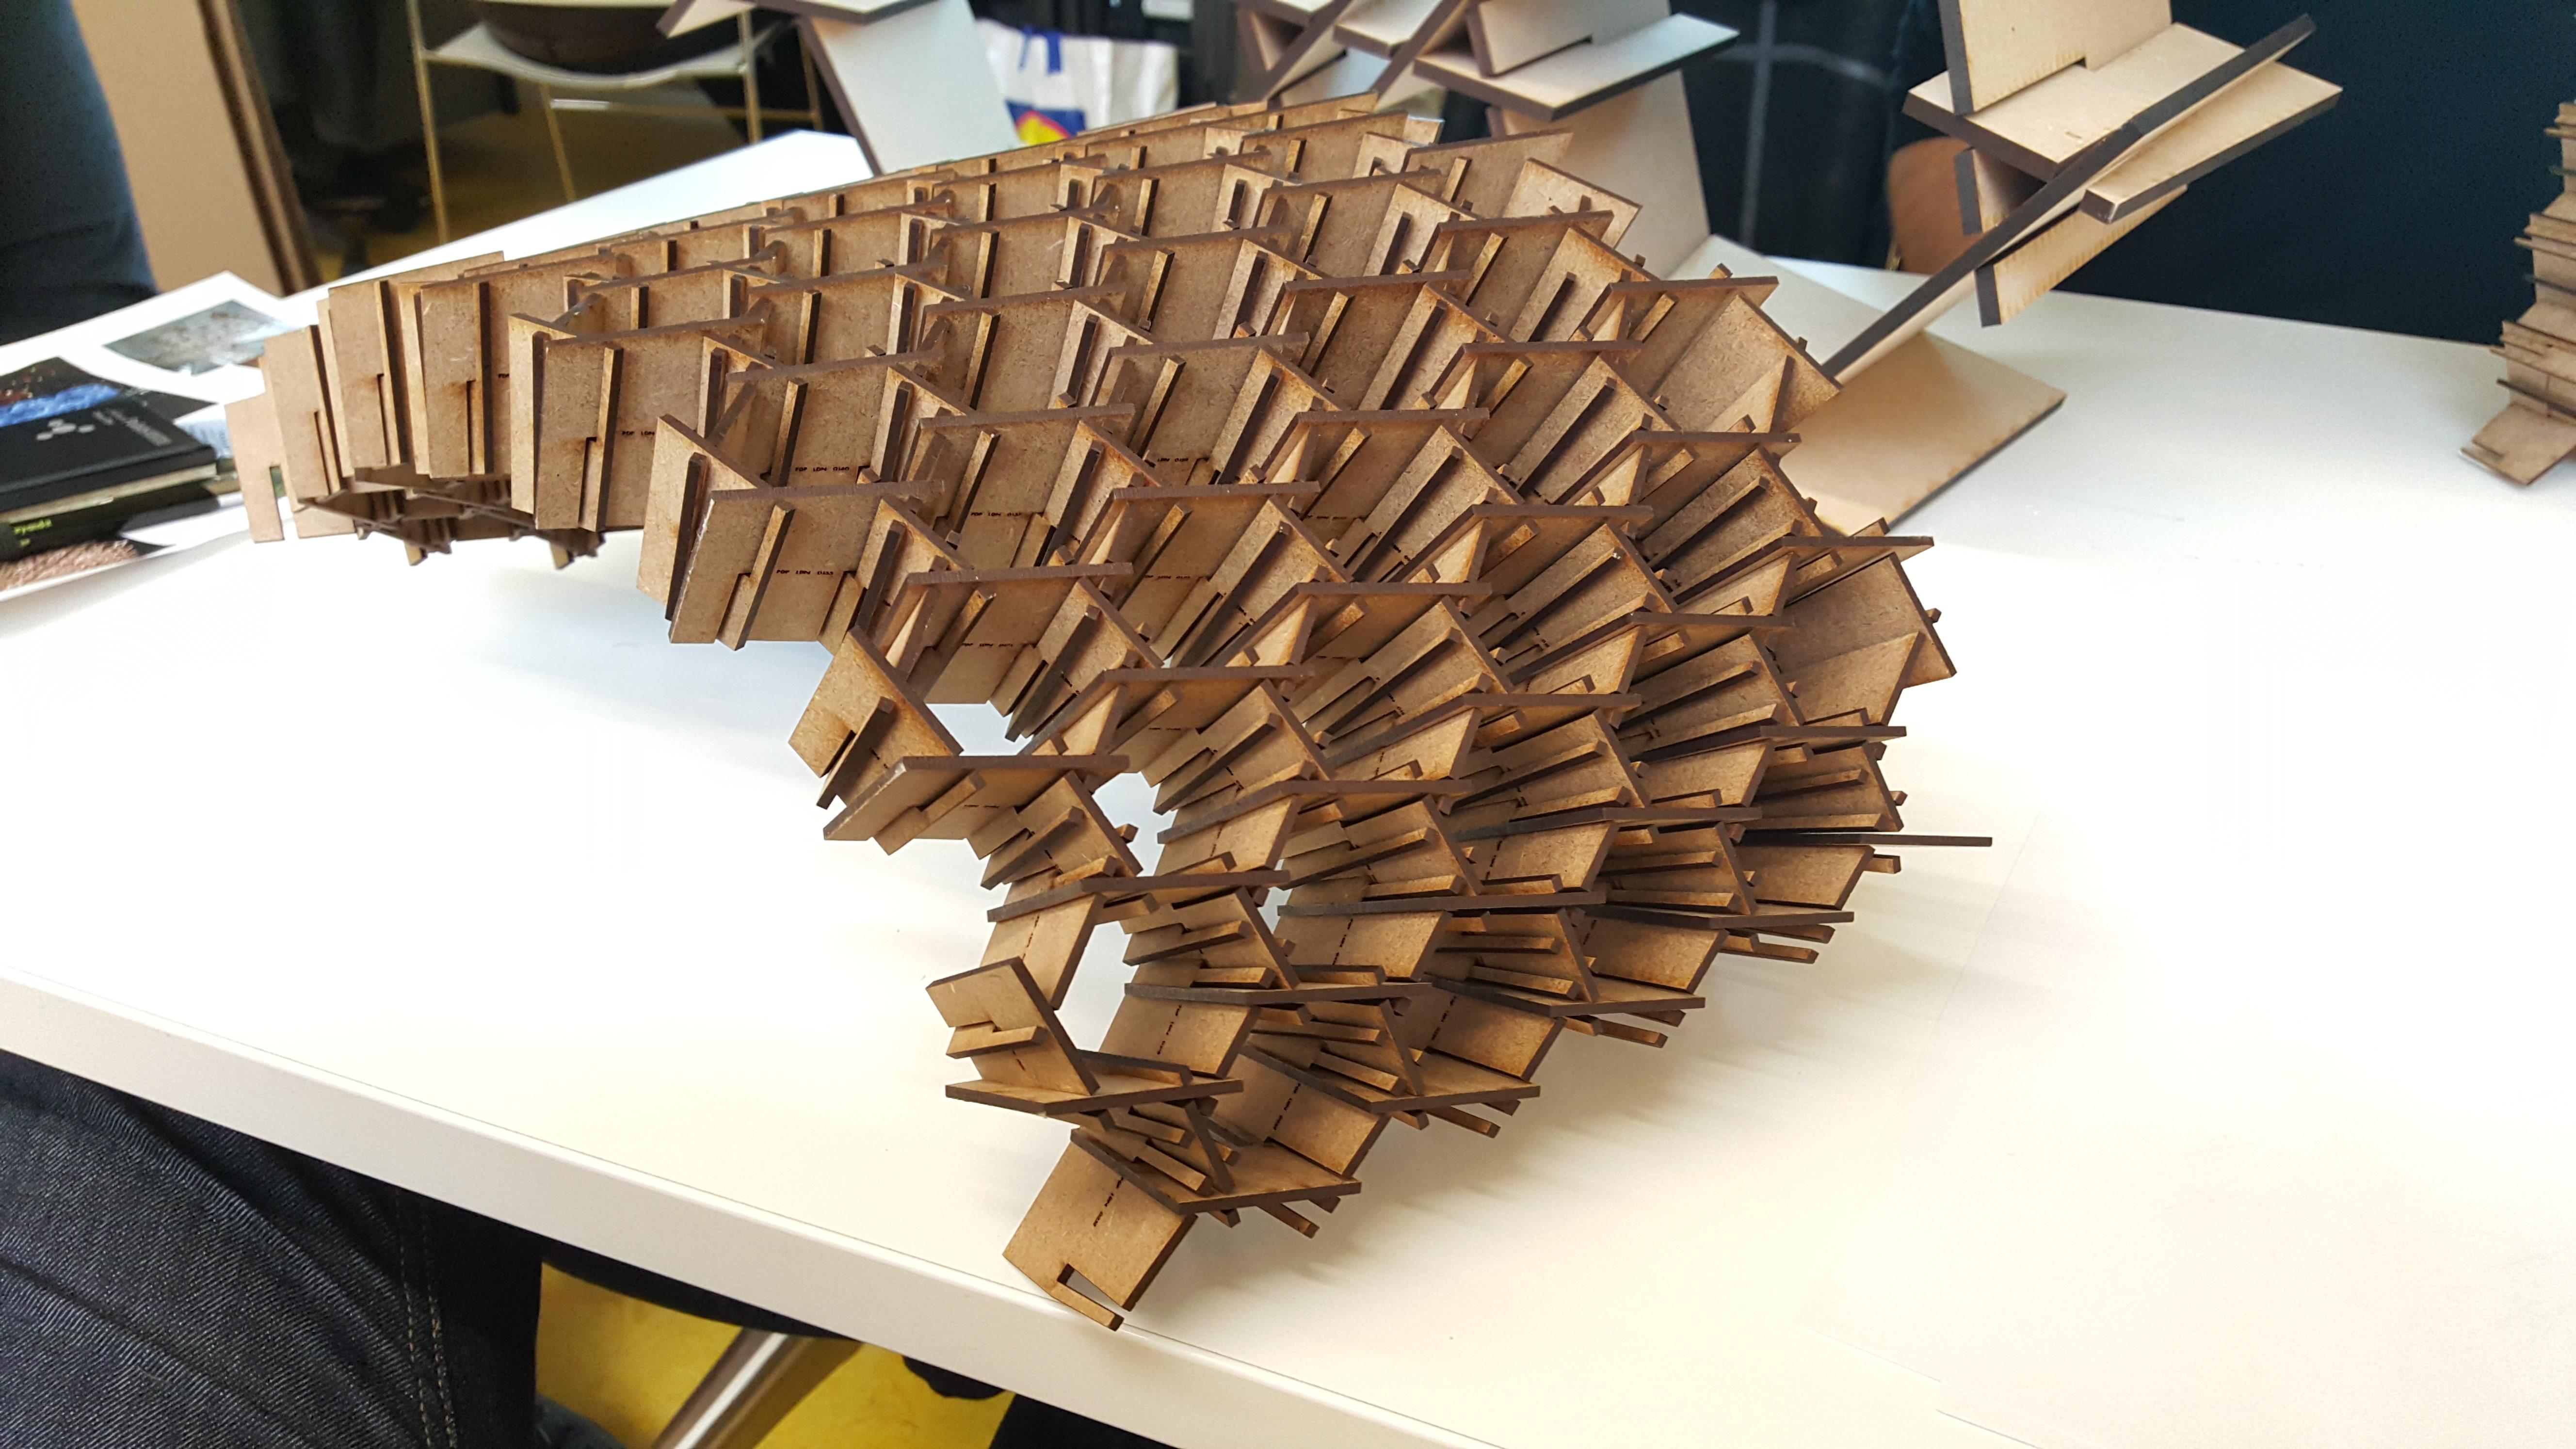 Variations on interlocking hexagons by Vlad Ignatescu